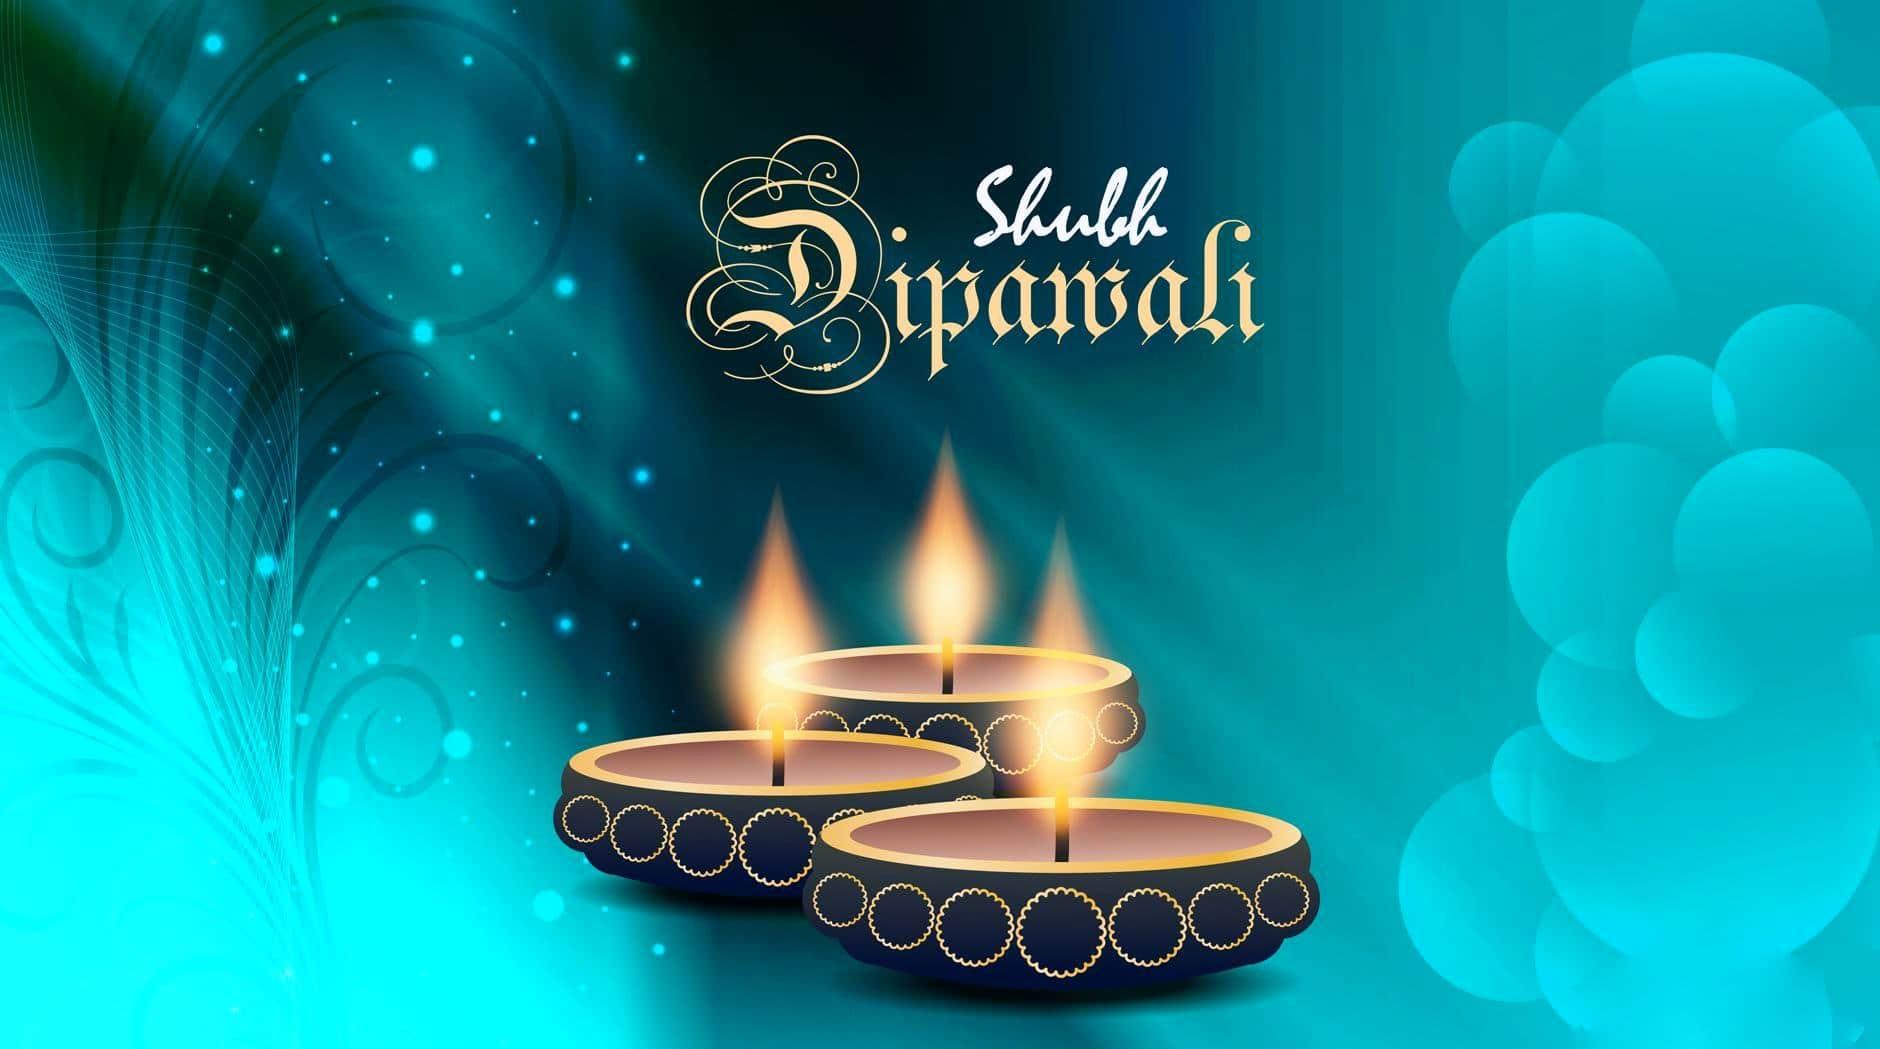 Subh Deepawali Images